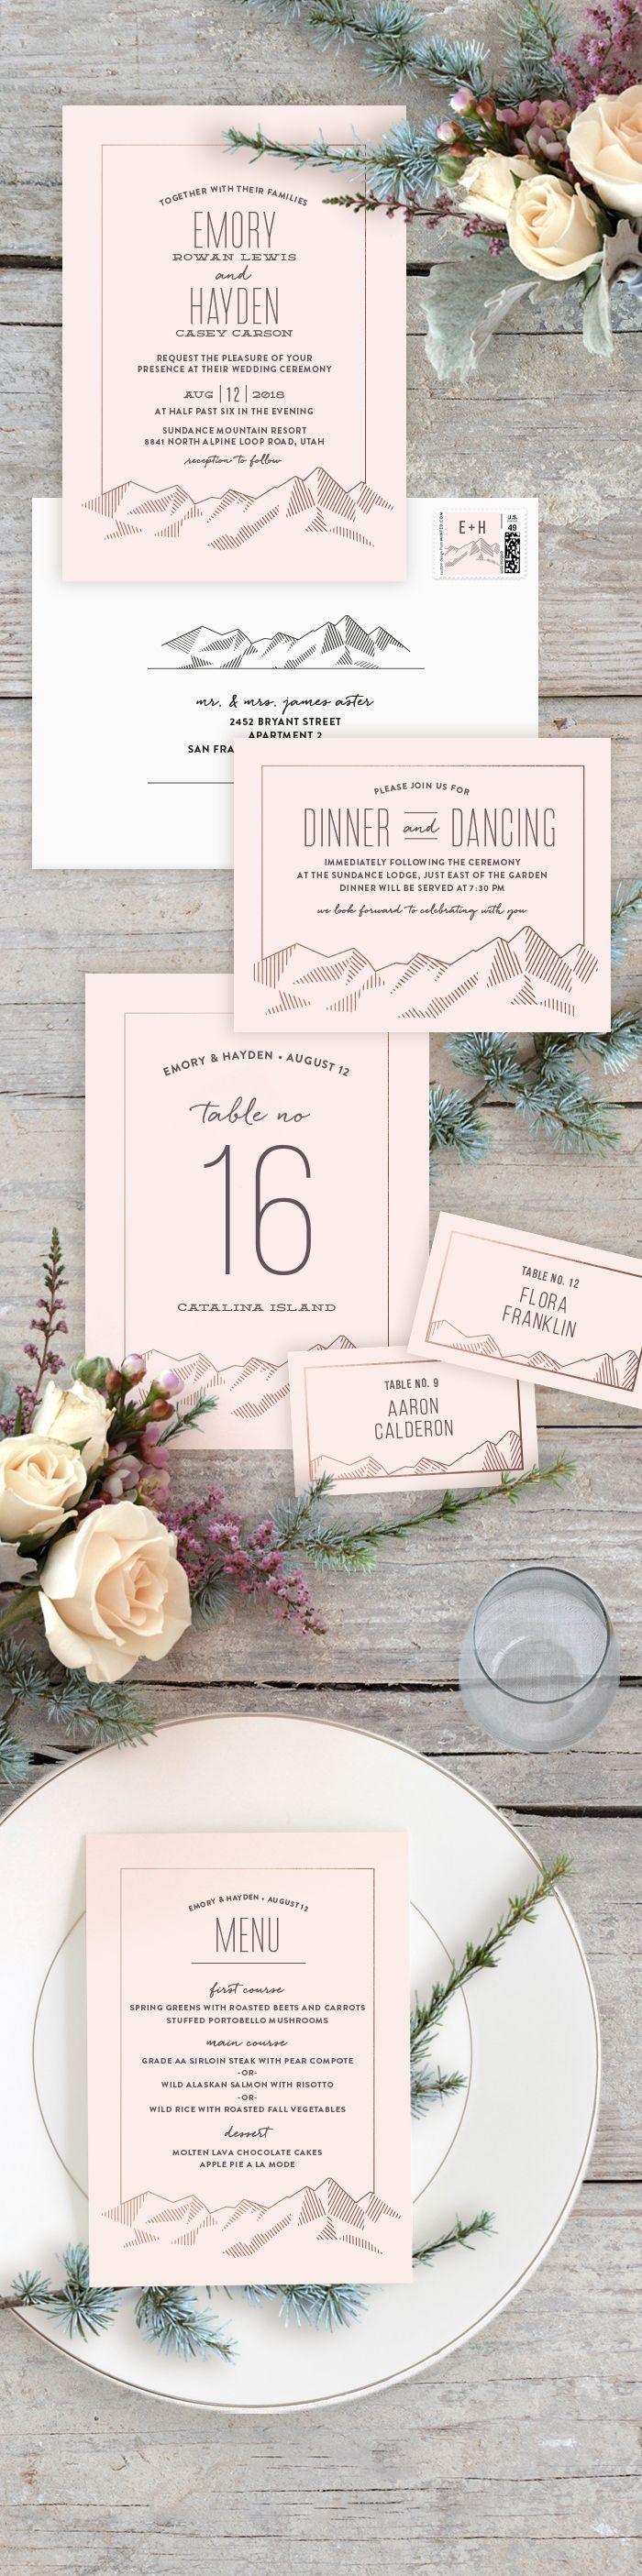 64 Best Wedding Invitations Stationery Images On Pinterest